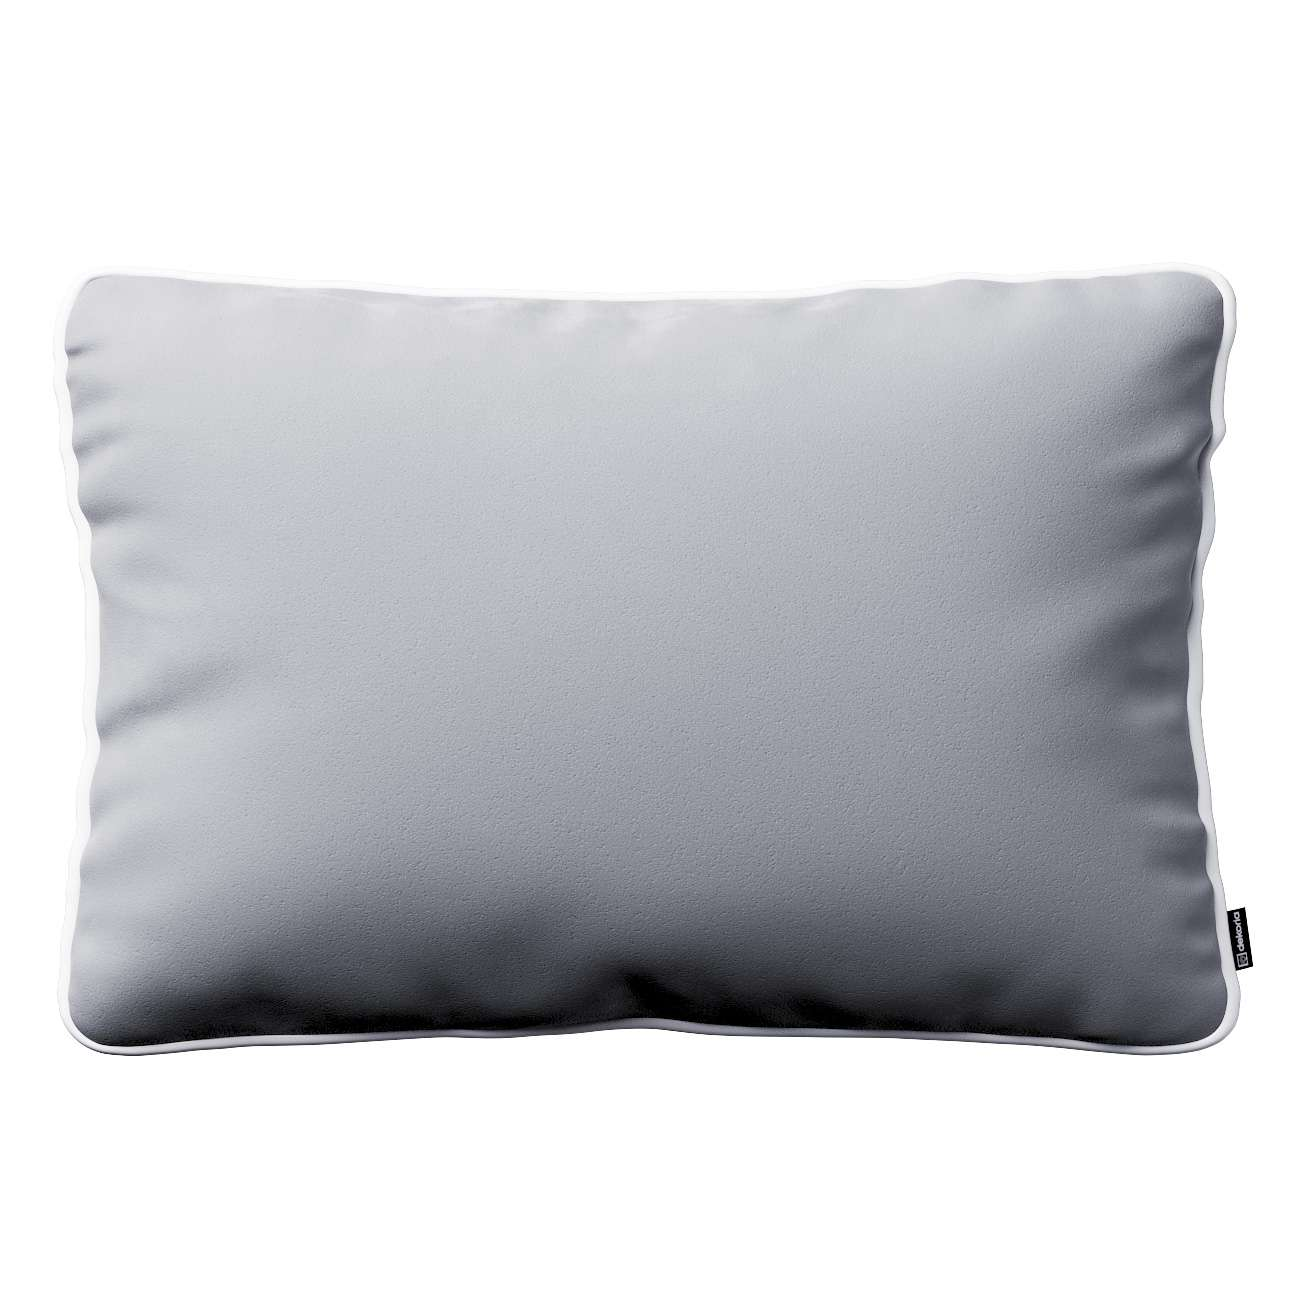 Poszewka Laura na poduszkę prostokątna 60 × 40 cm w kolekcji Velvet, tkanina: 704-24